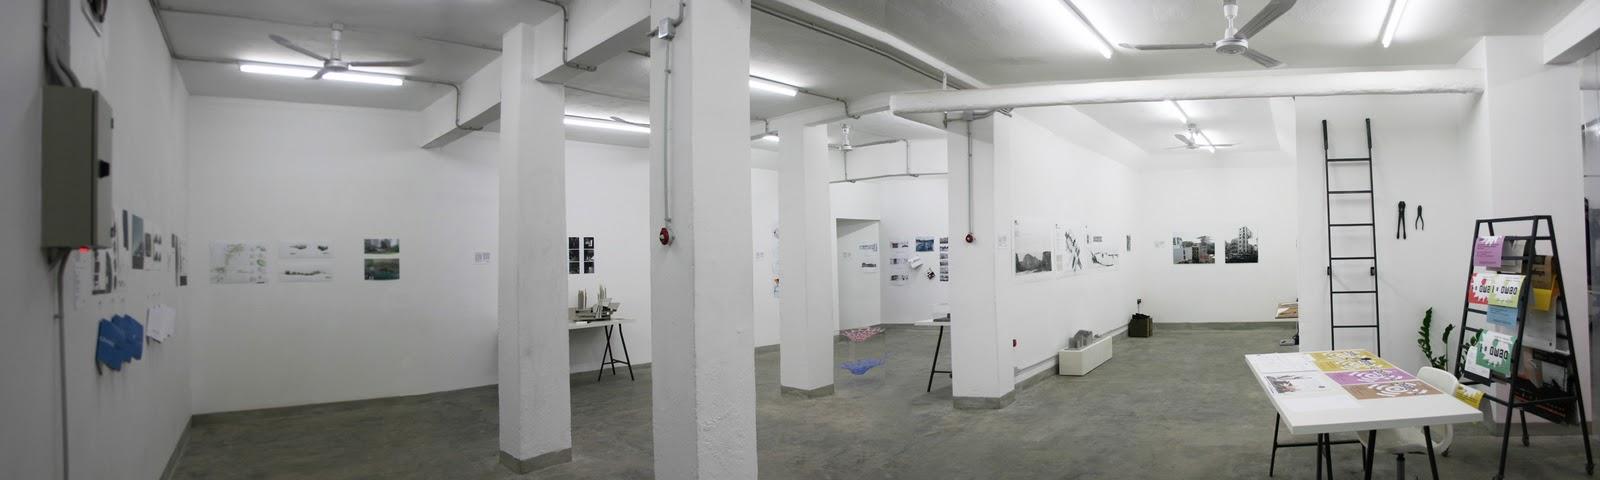 Exhibition DEMO #2 Architecture 03.jpg